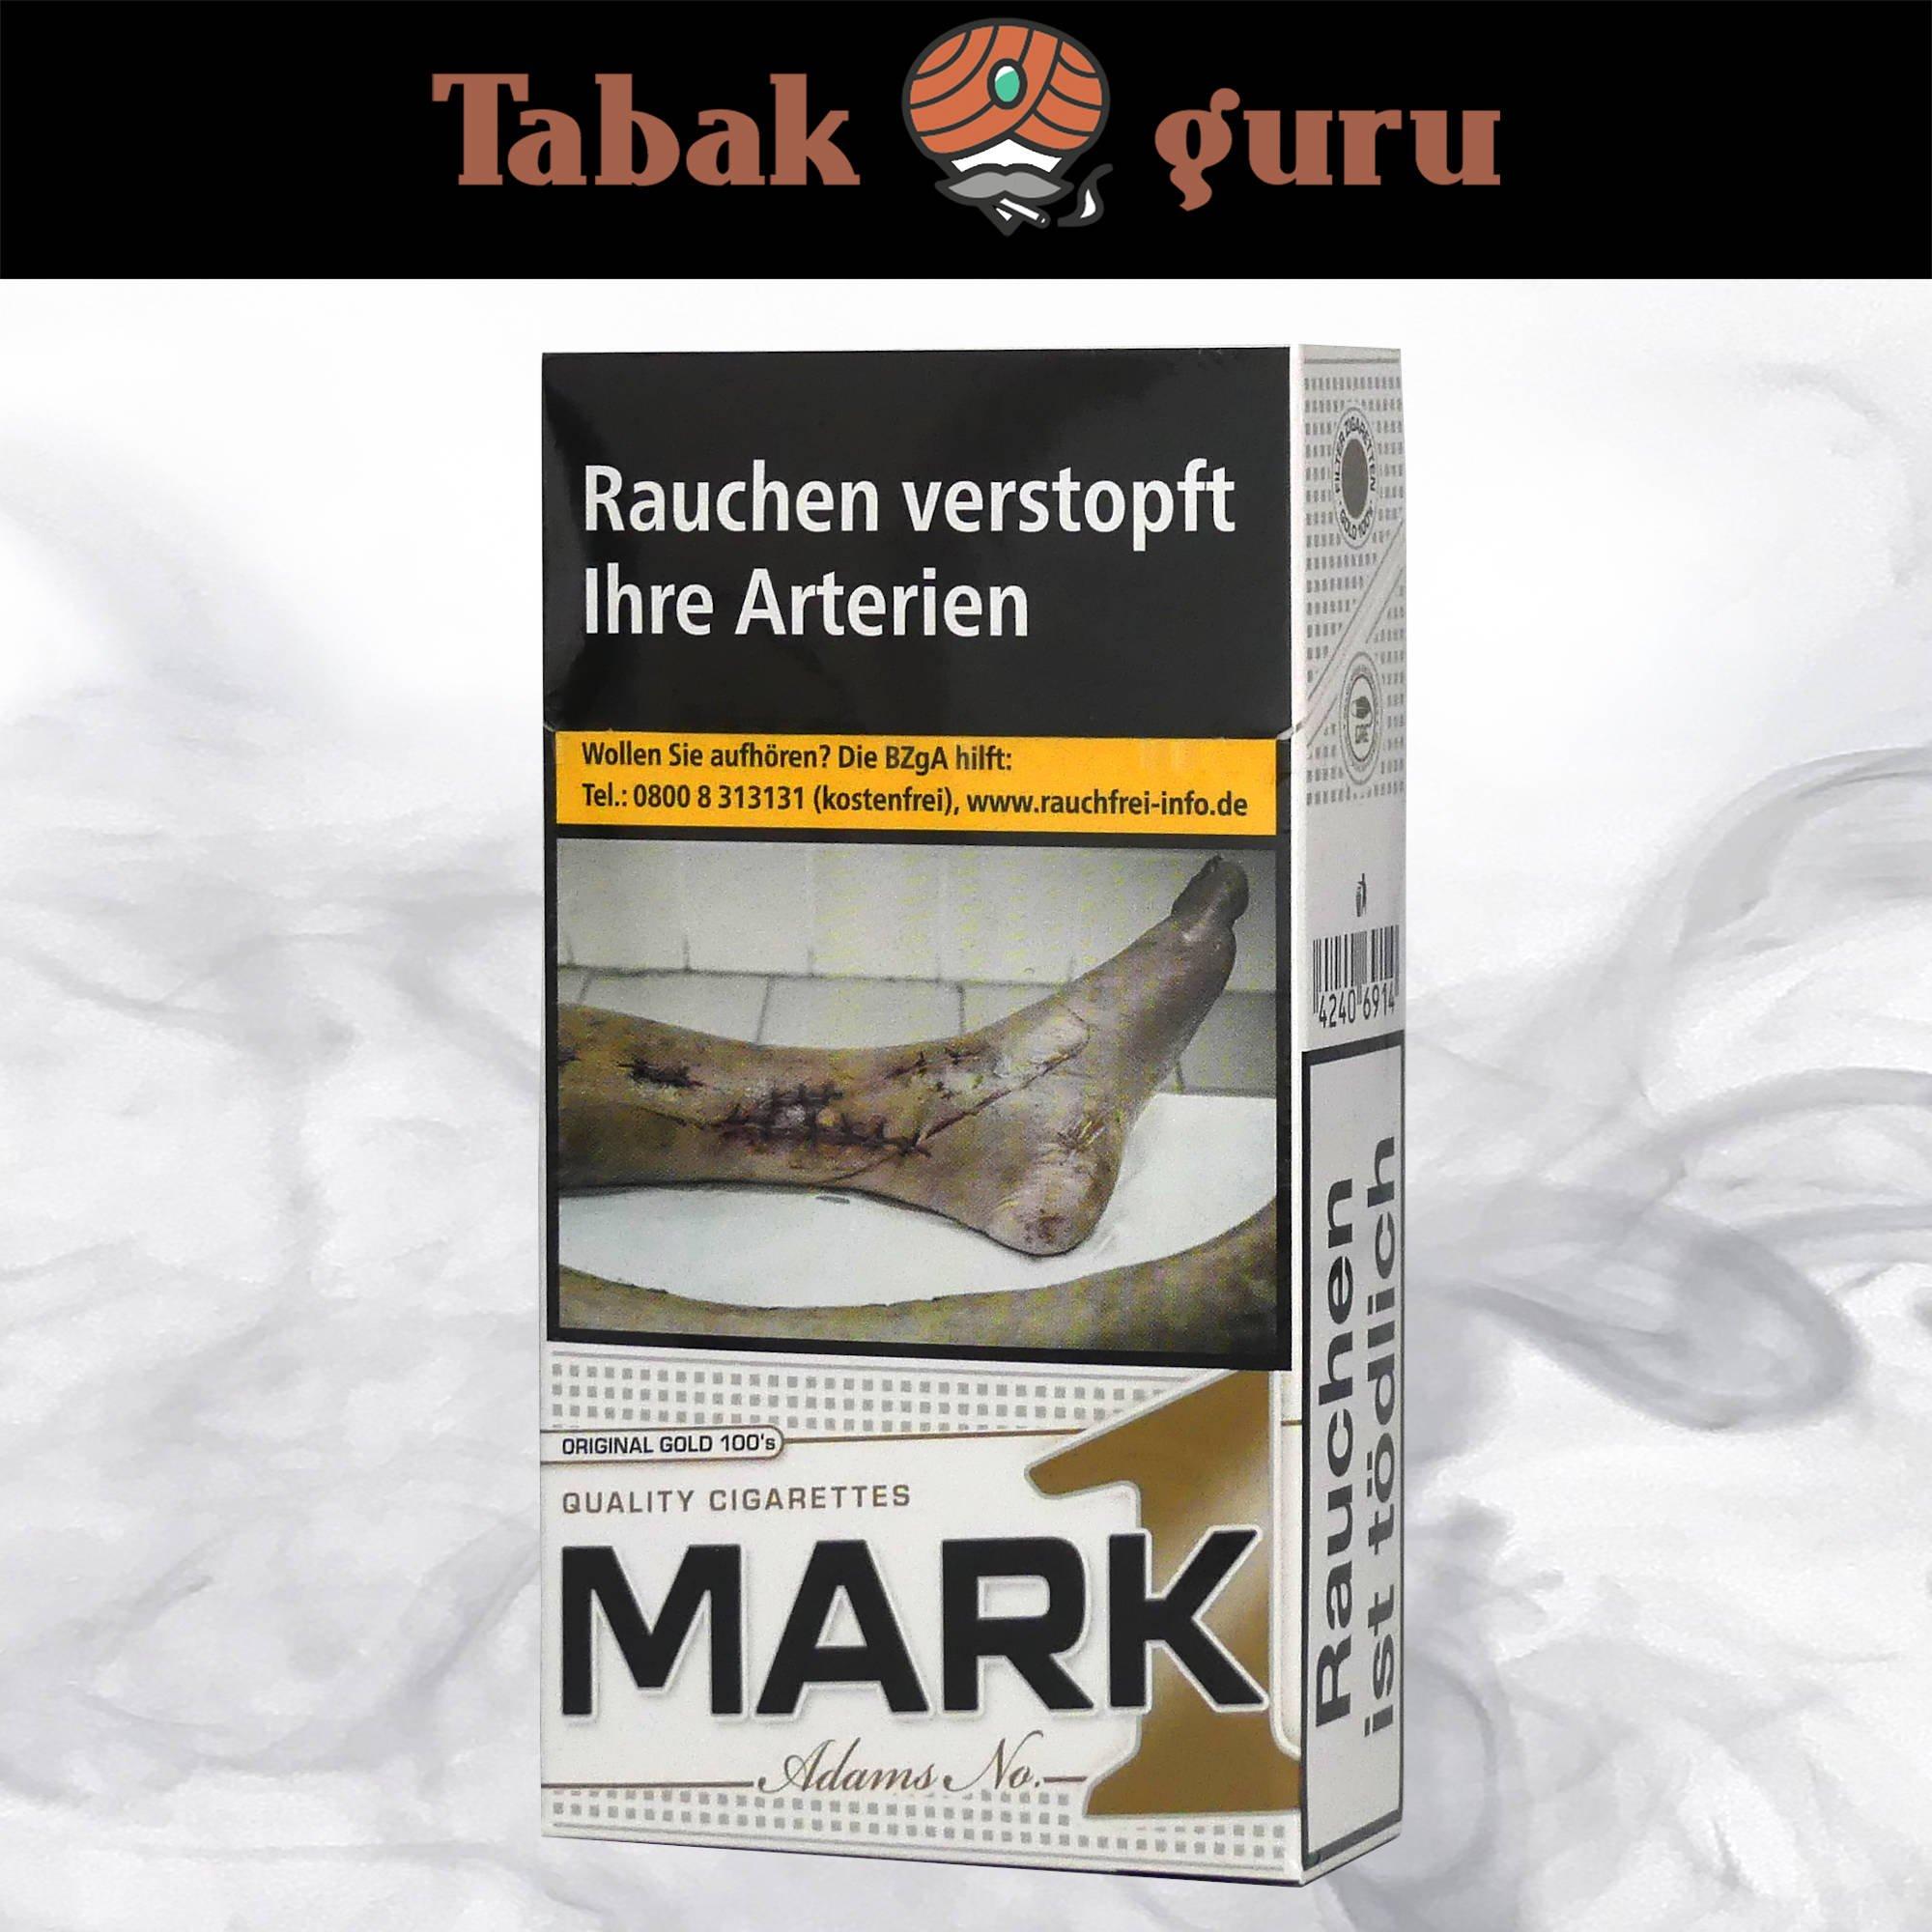 Mark Adams No. 1 / Mark1 Original Gold 100's 20 Stück